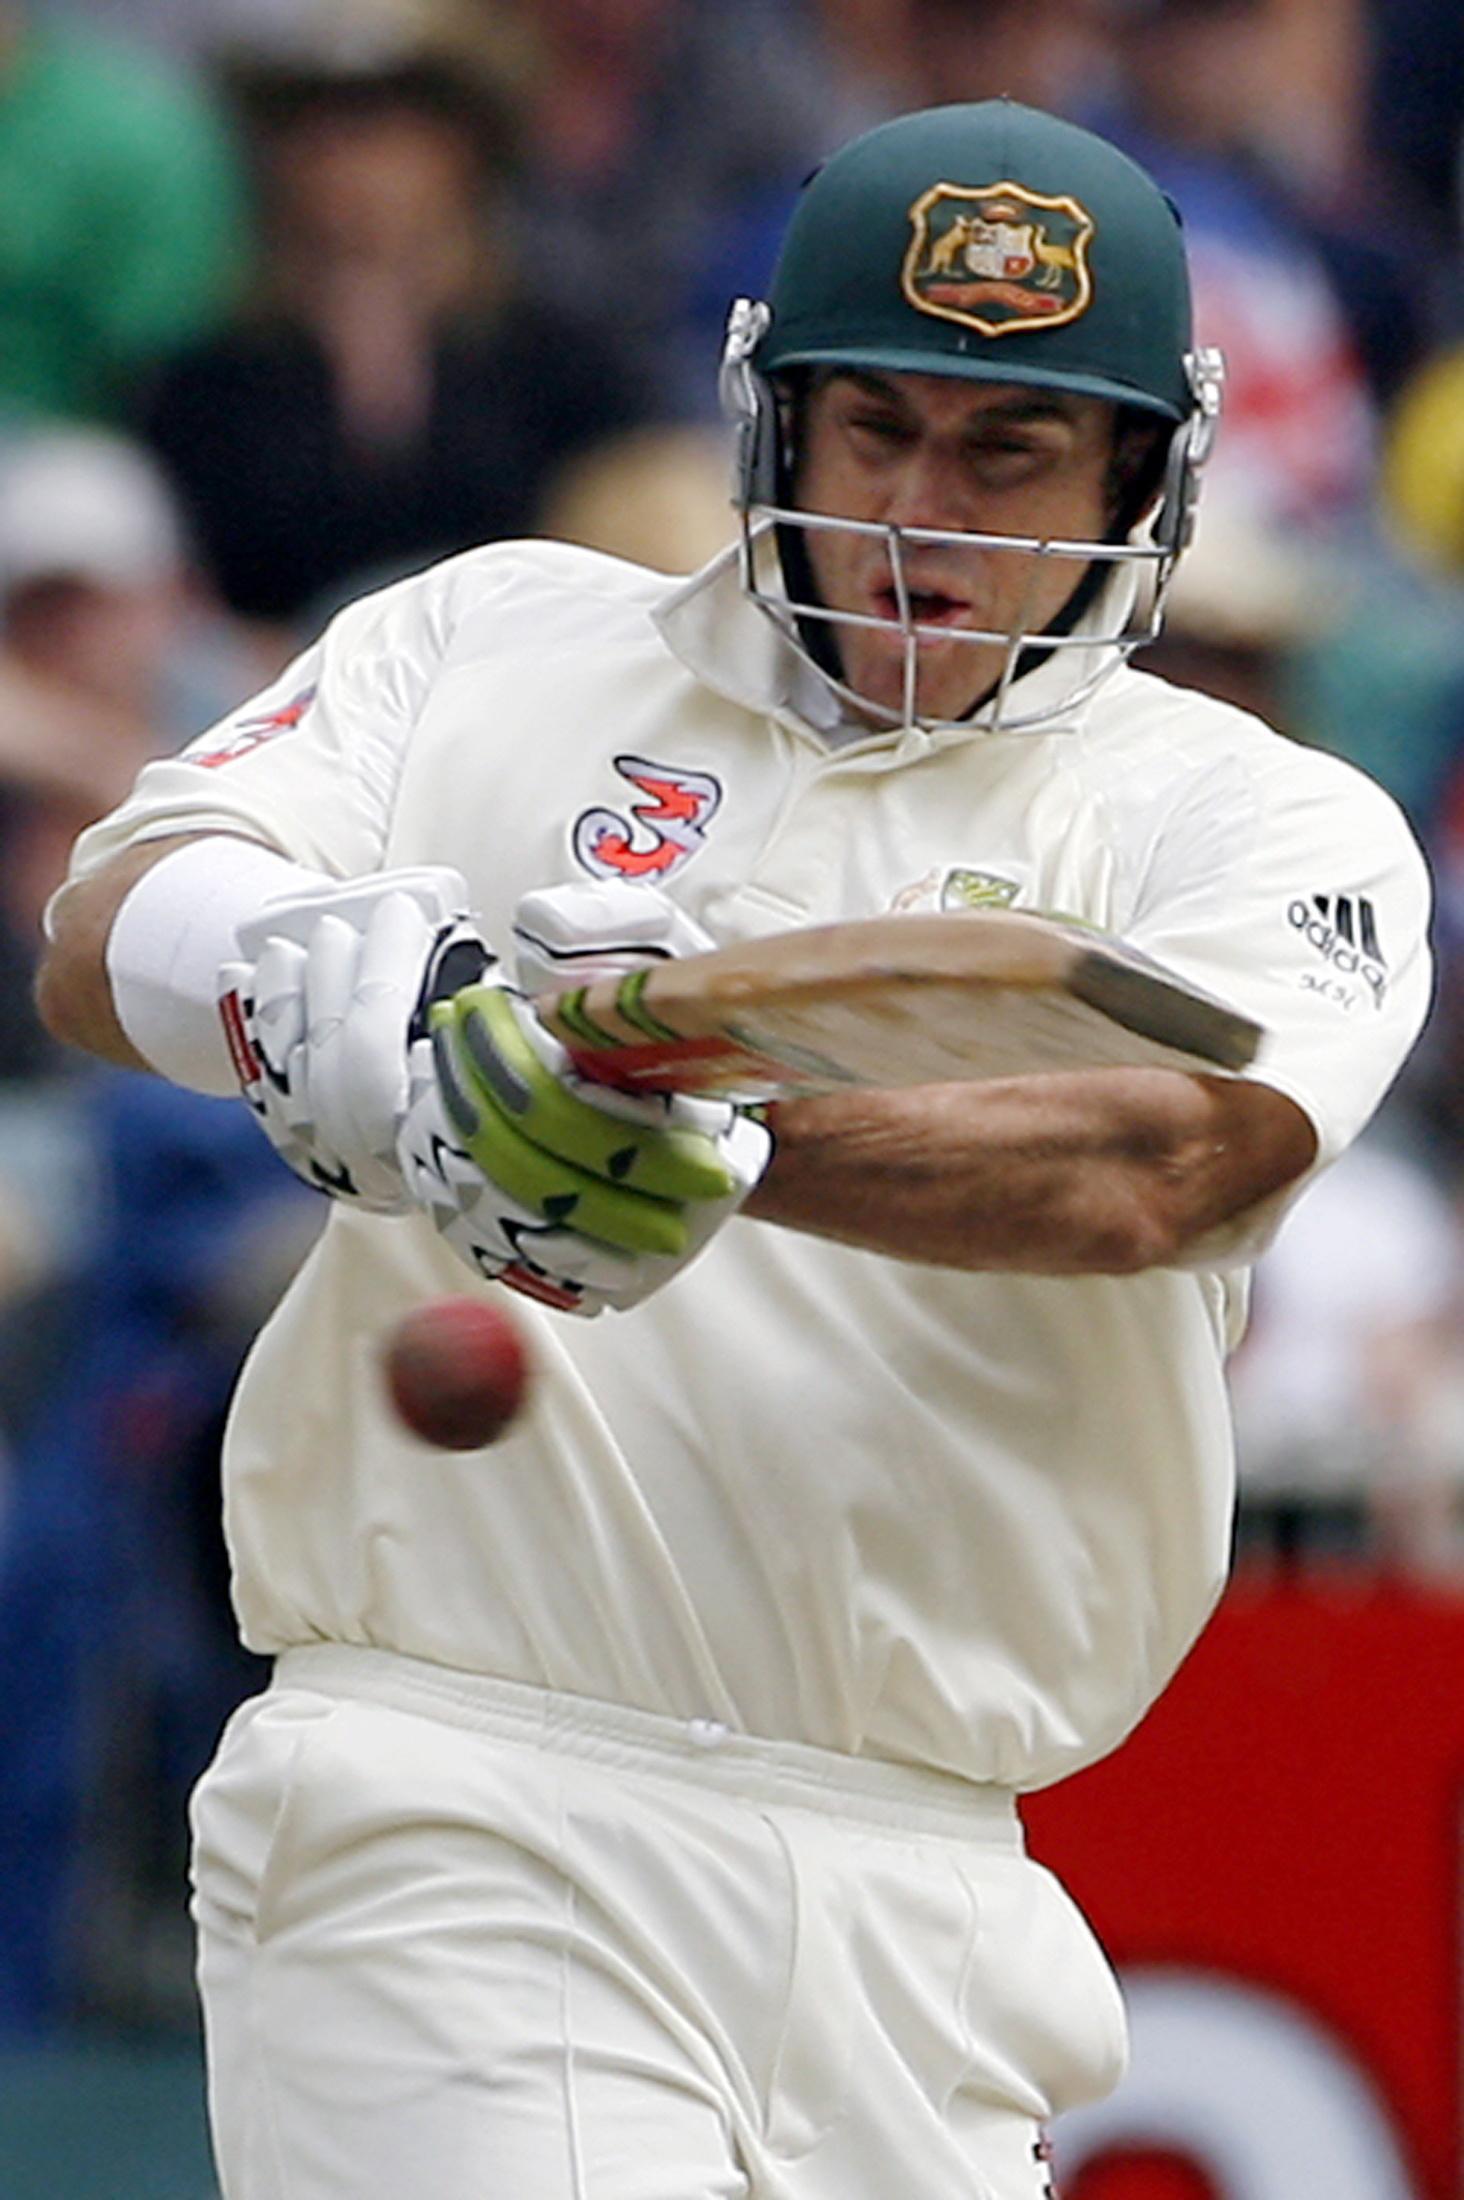 Matthew Hayden retired in 2009 after scoring 8,625 runs for Australia